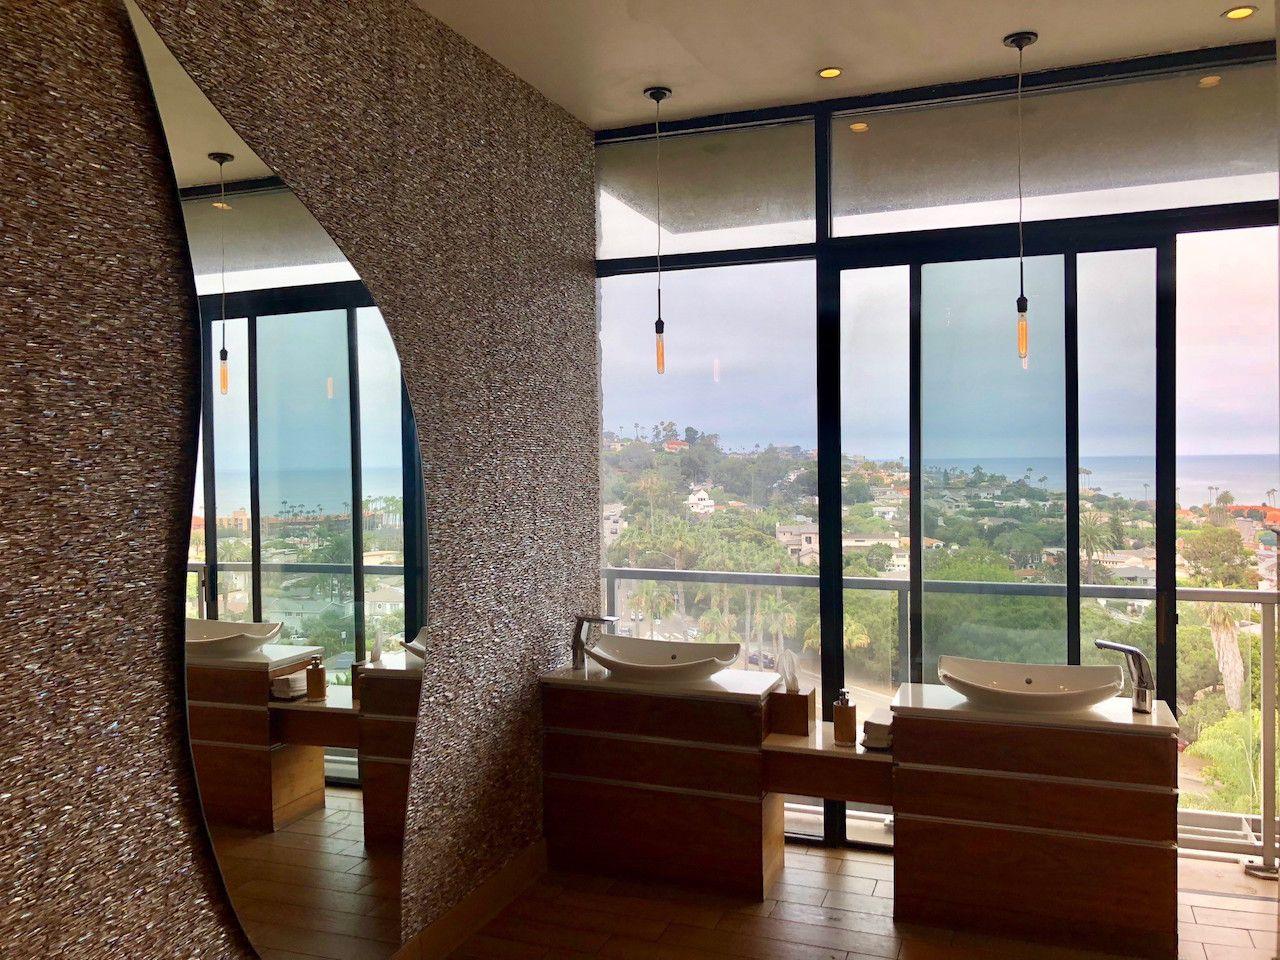 Bathroom in Hotel La Jolla in California